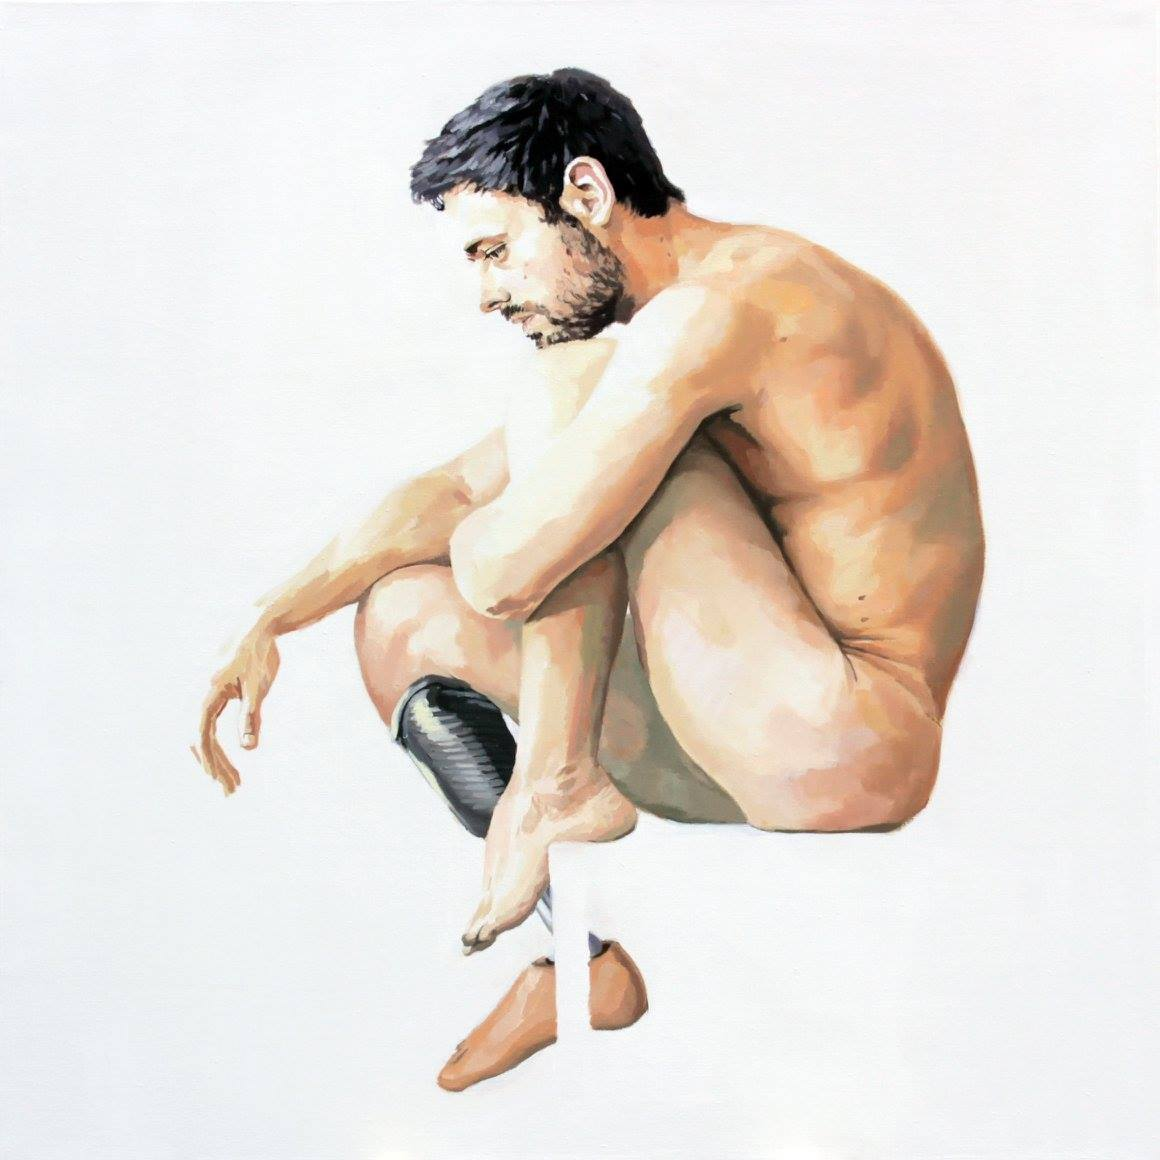 Limb of Theseus (2016) - Pablo Mercado